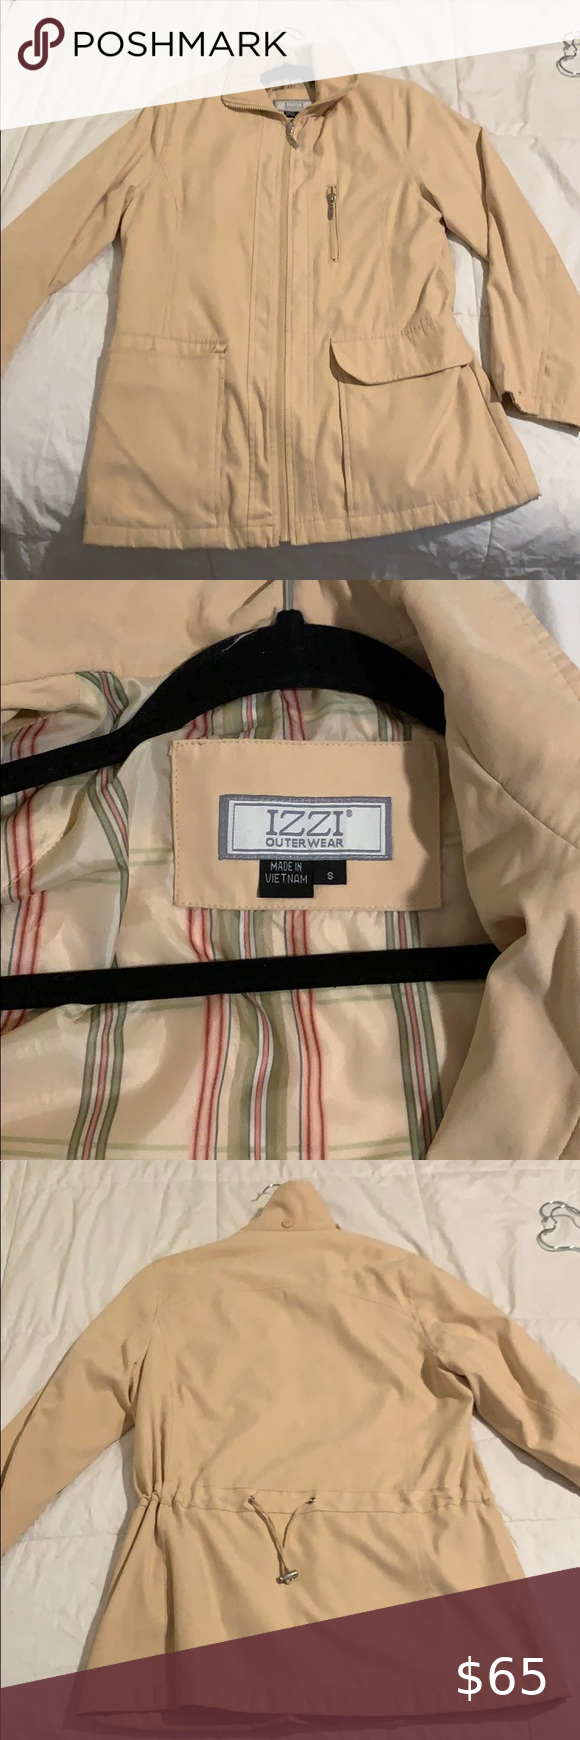 Vintage Izzi Coat Coats Jackets Women Chambray Jacket Green Faux Fur Coat [ 1740 x 580 Pixel ]